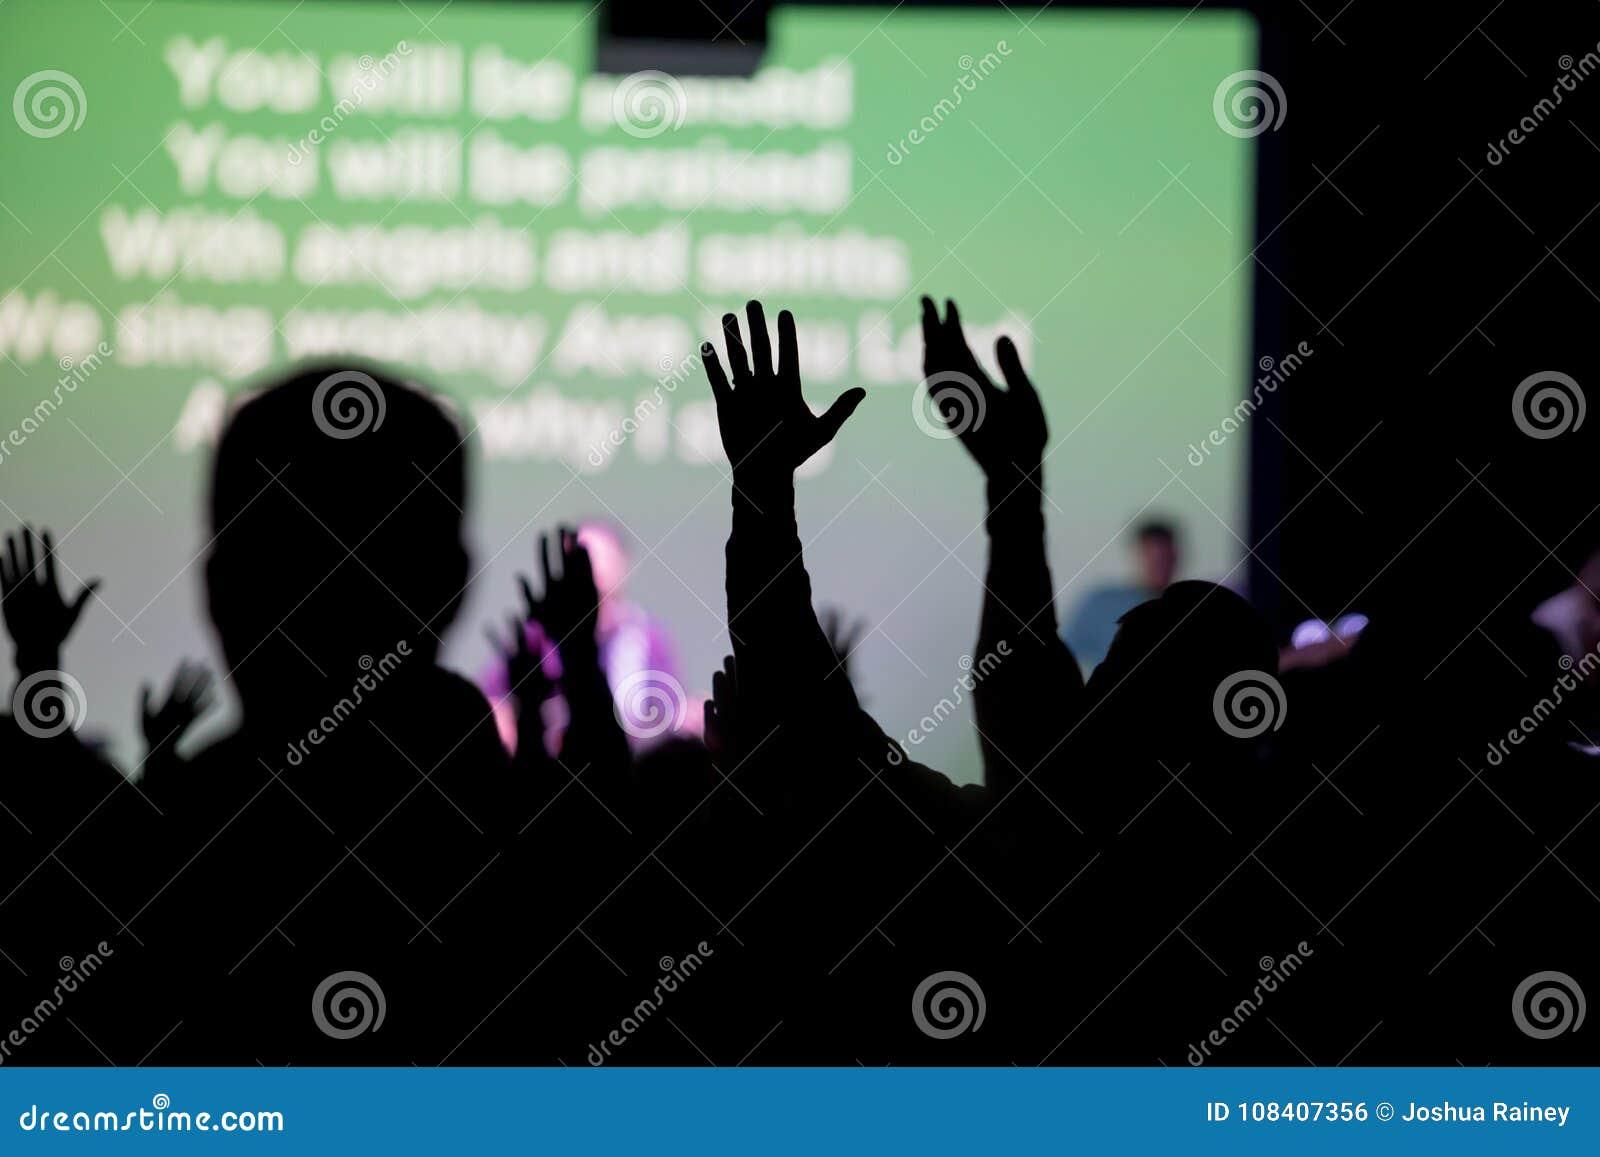 Christians Worshipping at Church